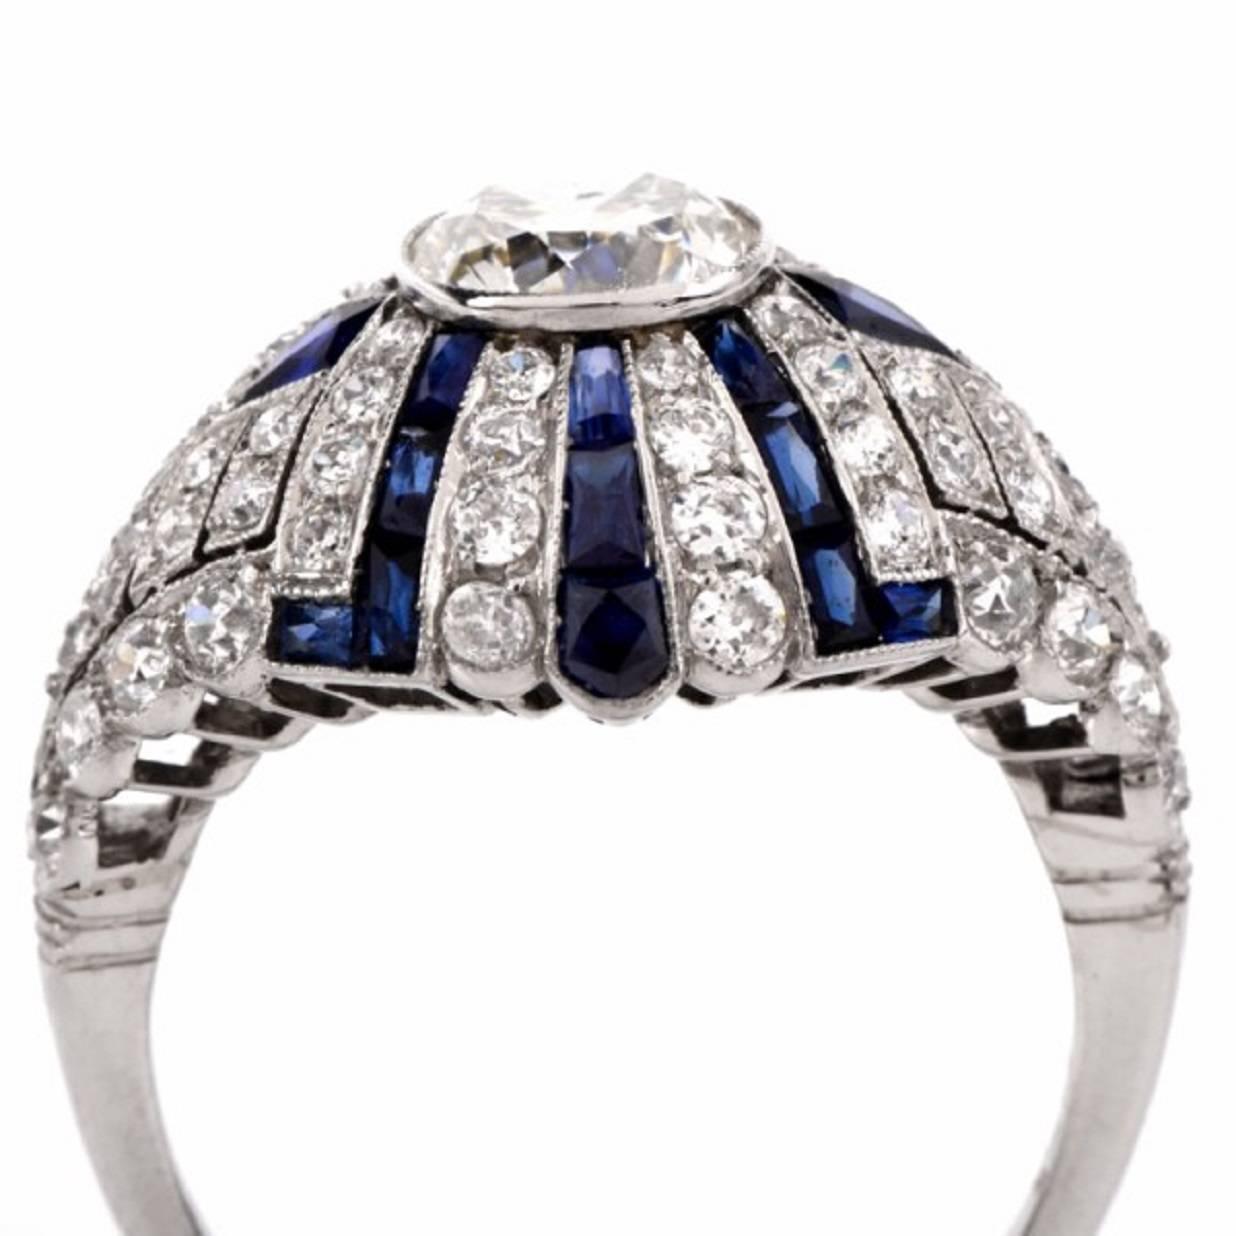 Antique Diamond Sapphire platinum ring For Sale at 1stdibs